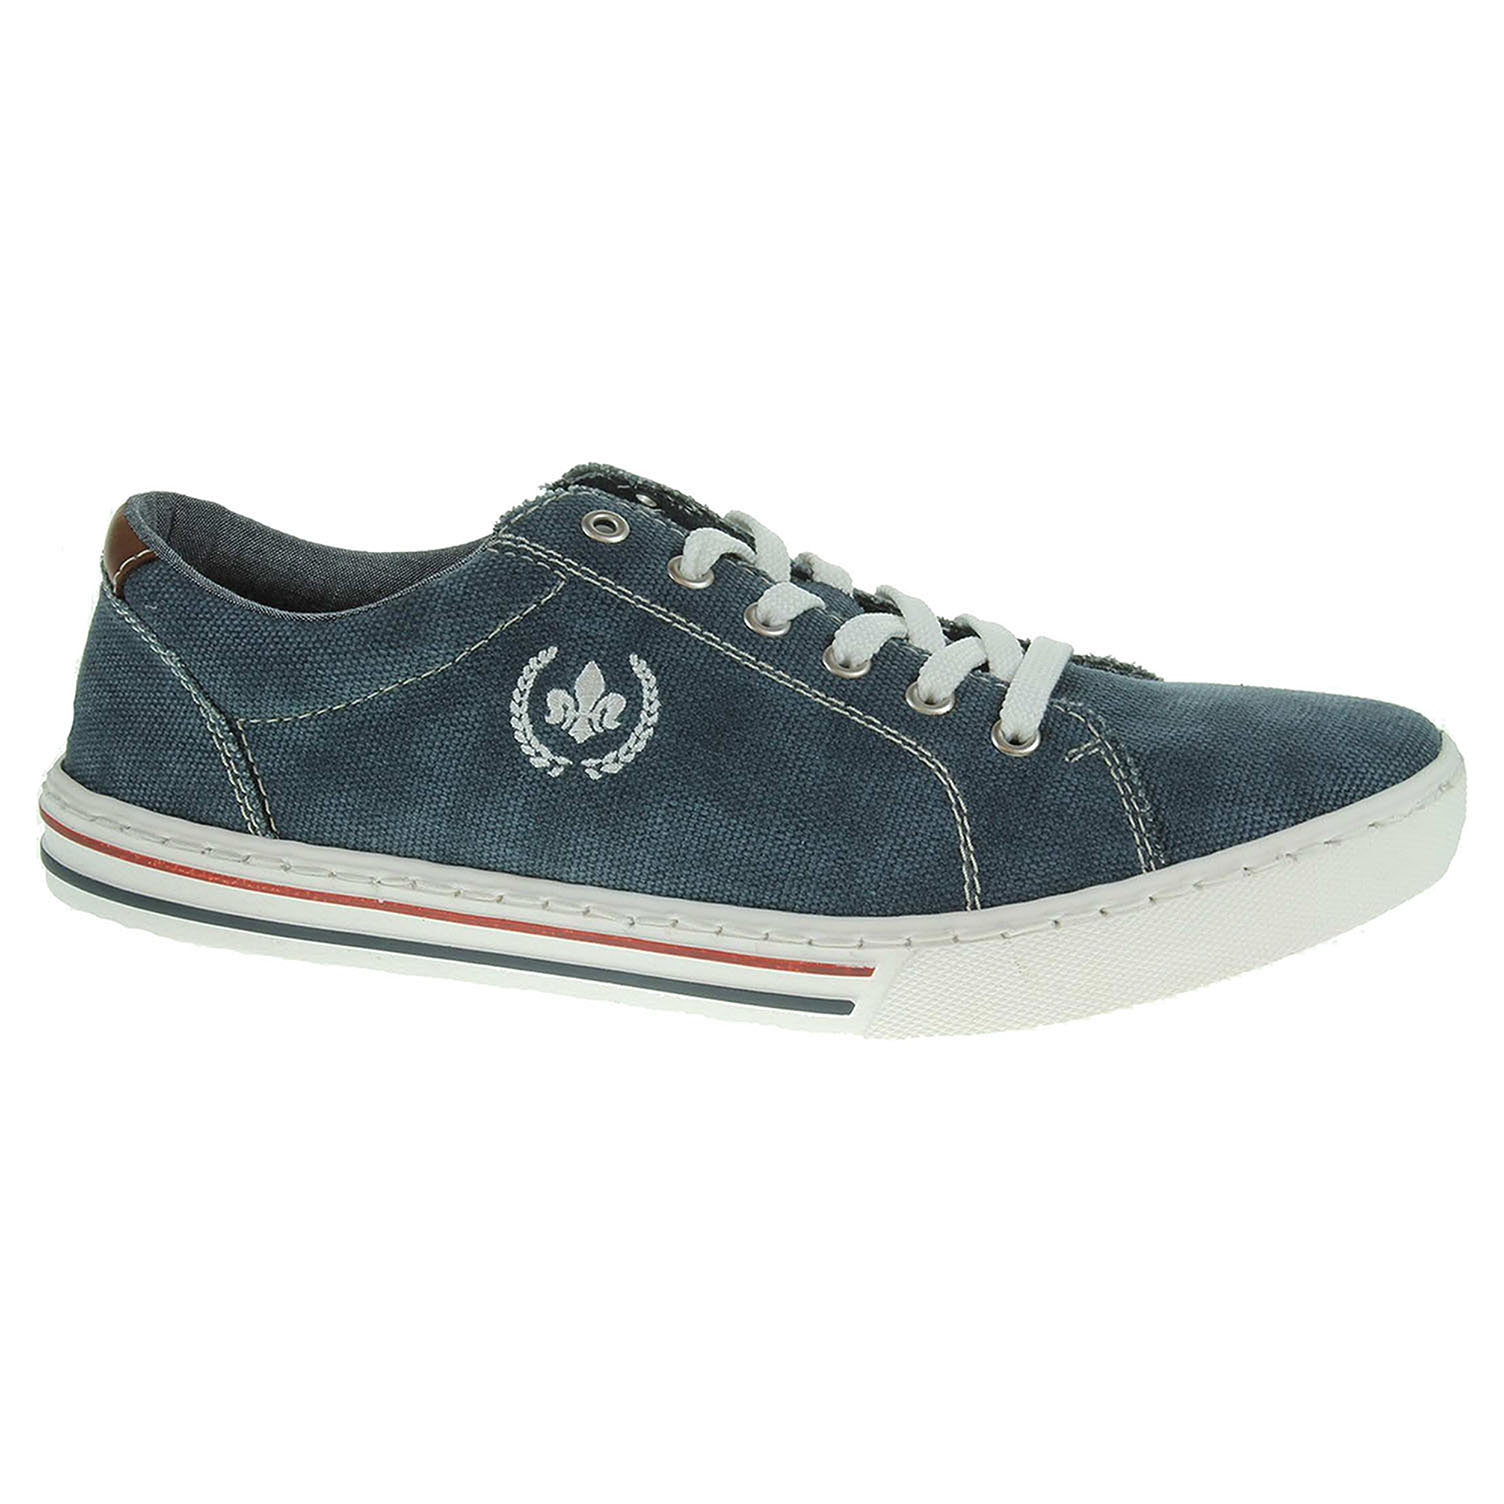 8fc4a738ac8d Ecco Pánská obuv Rieker 19501-14 modrá 24000454